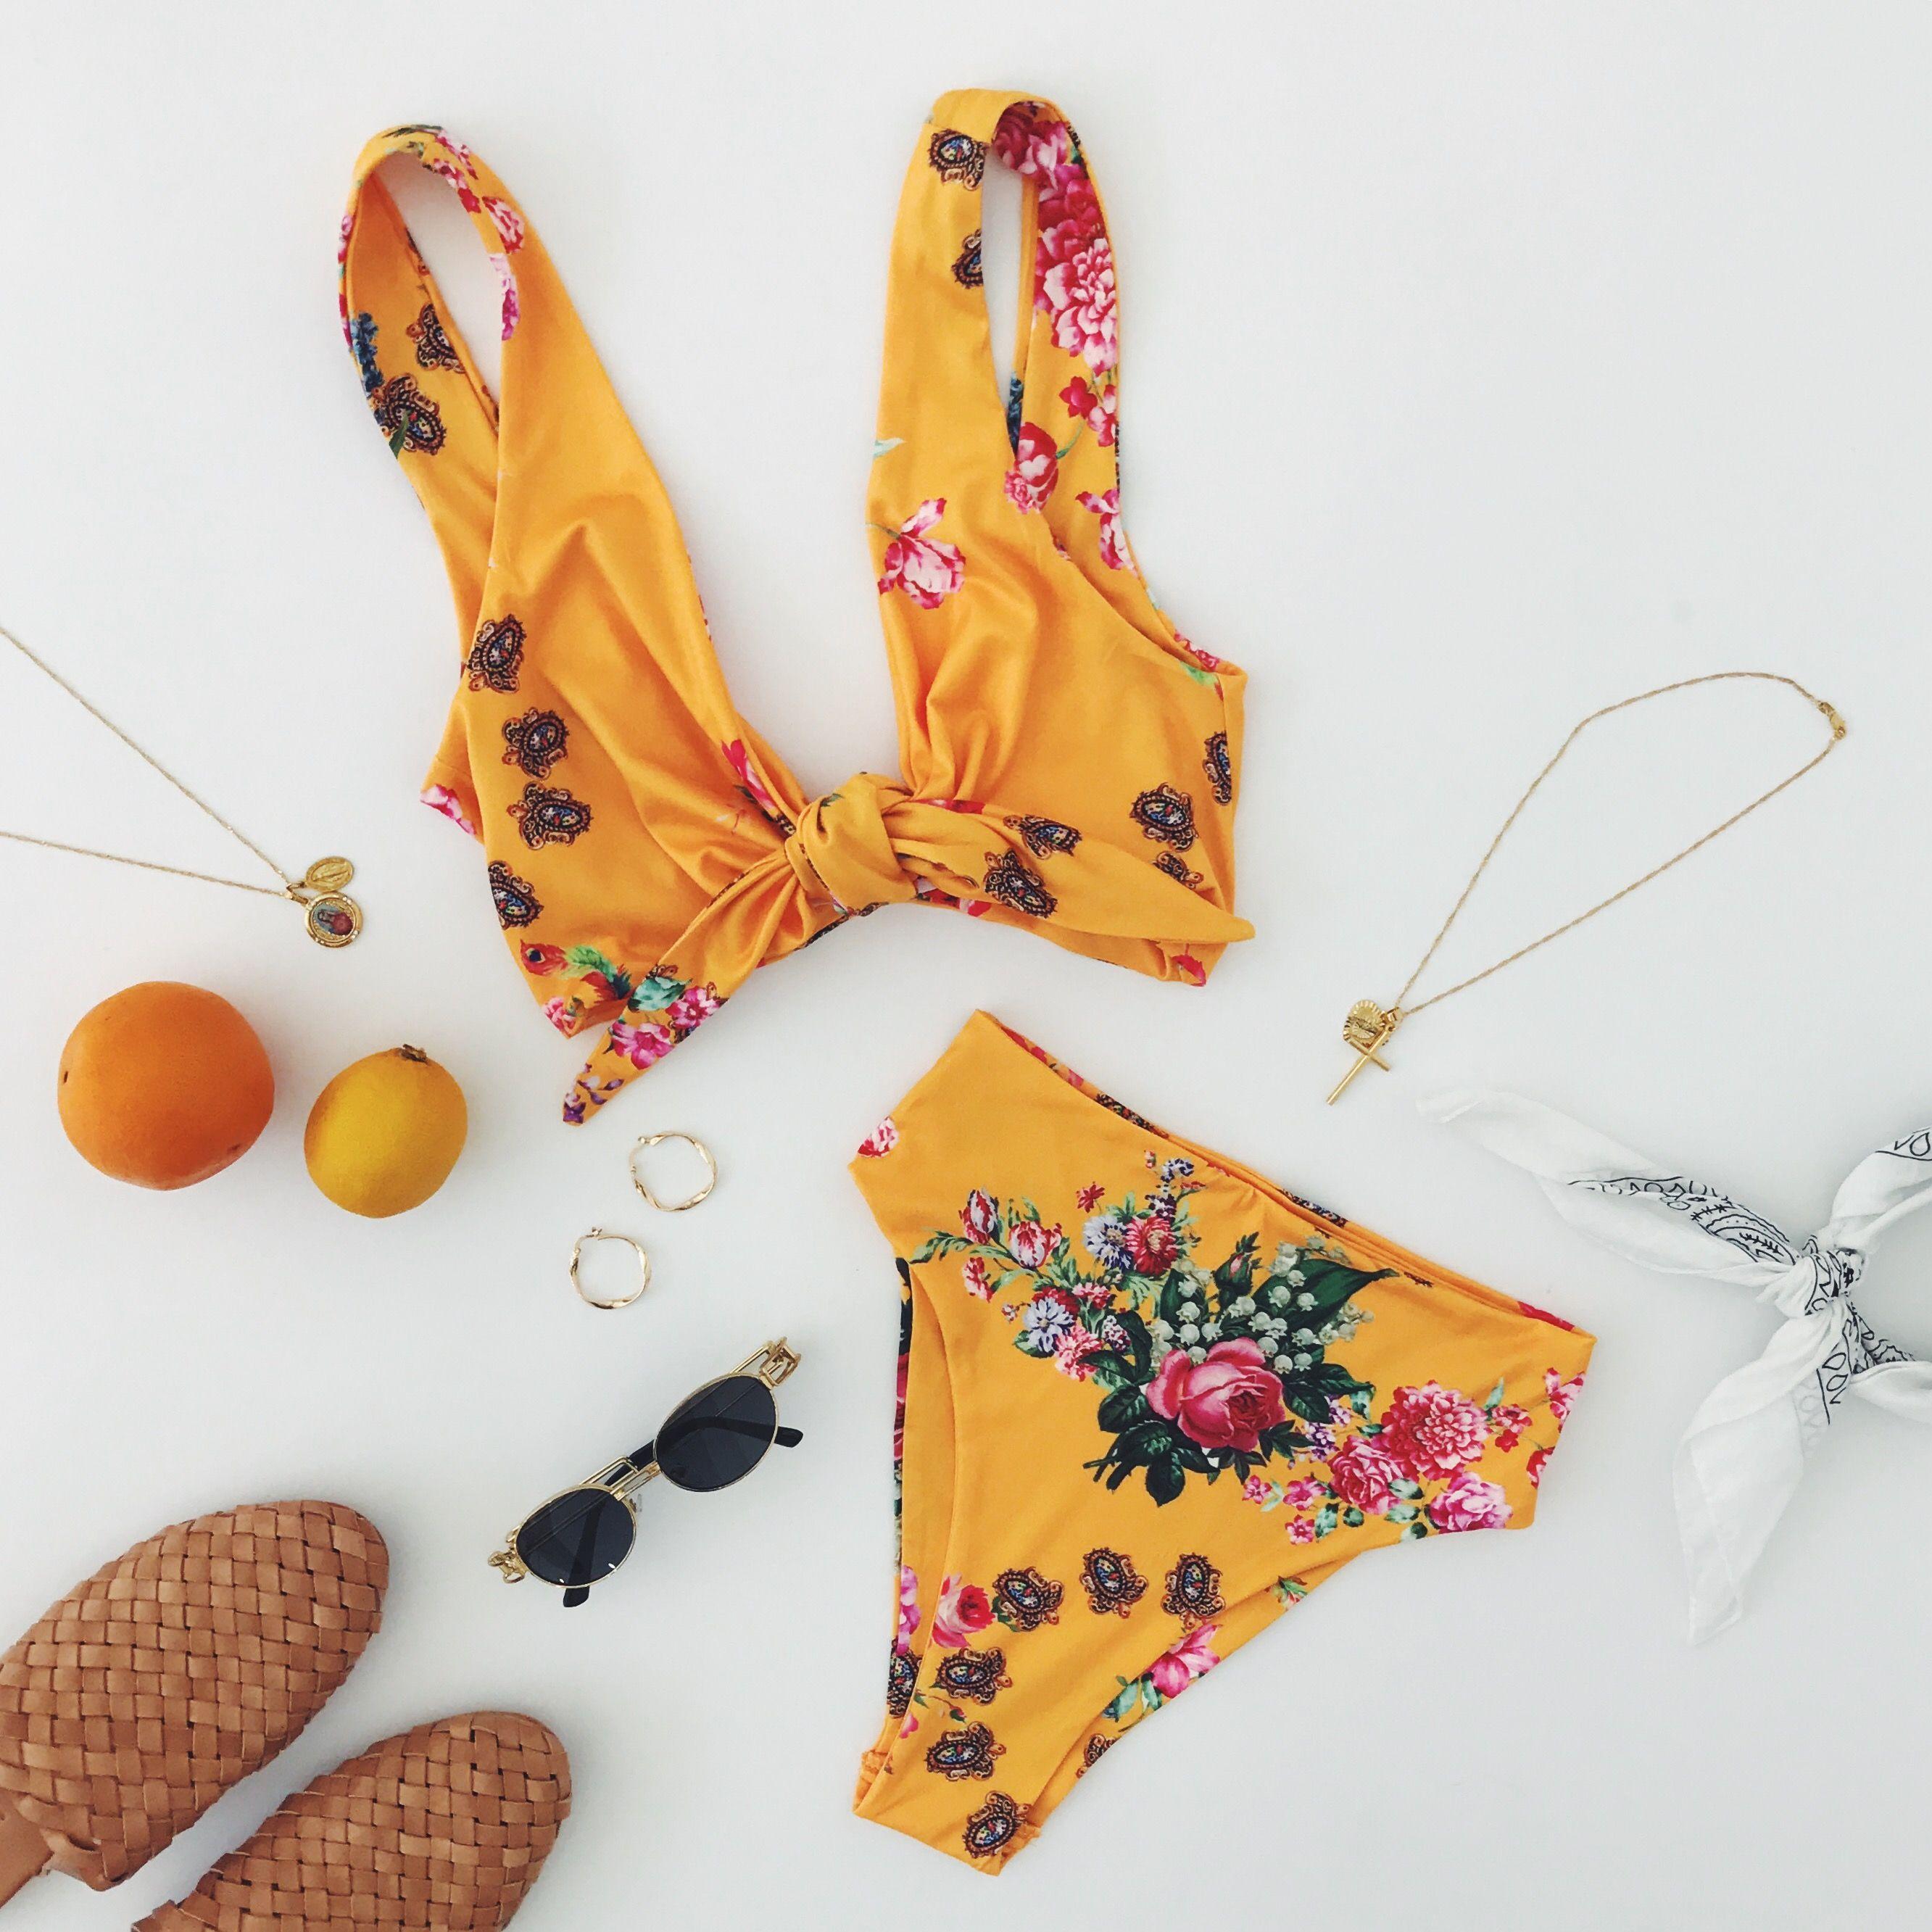 Pin by Kiona Carriker on Bikini inspiration  be4ccdaac